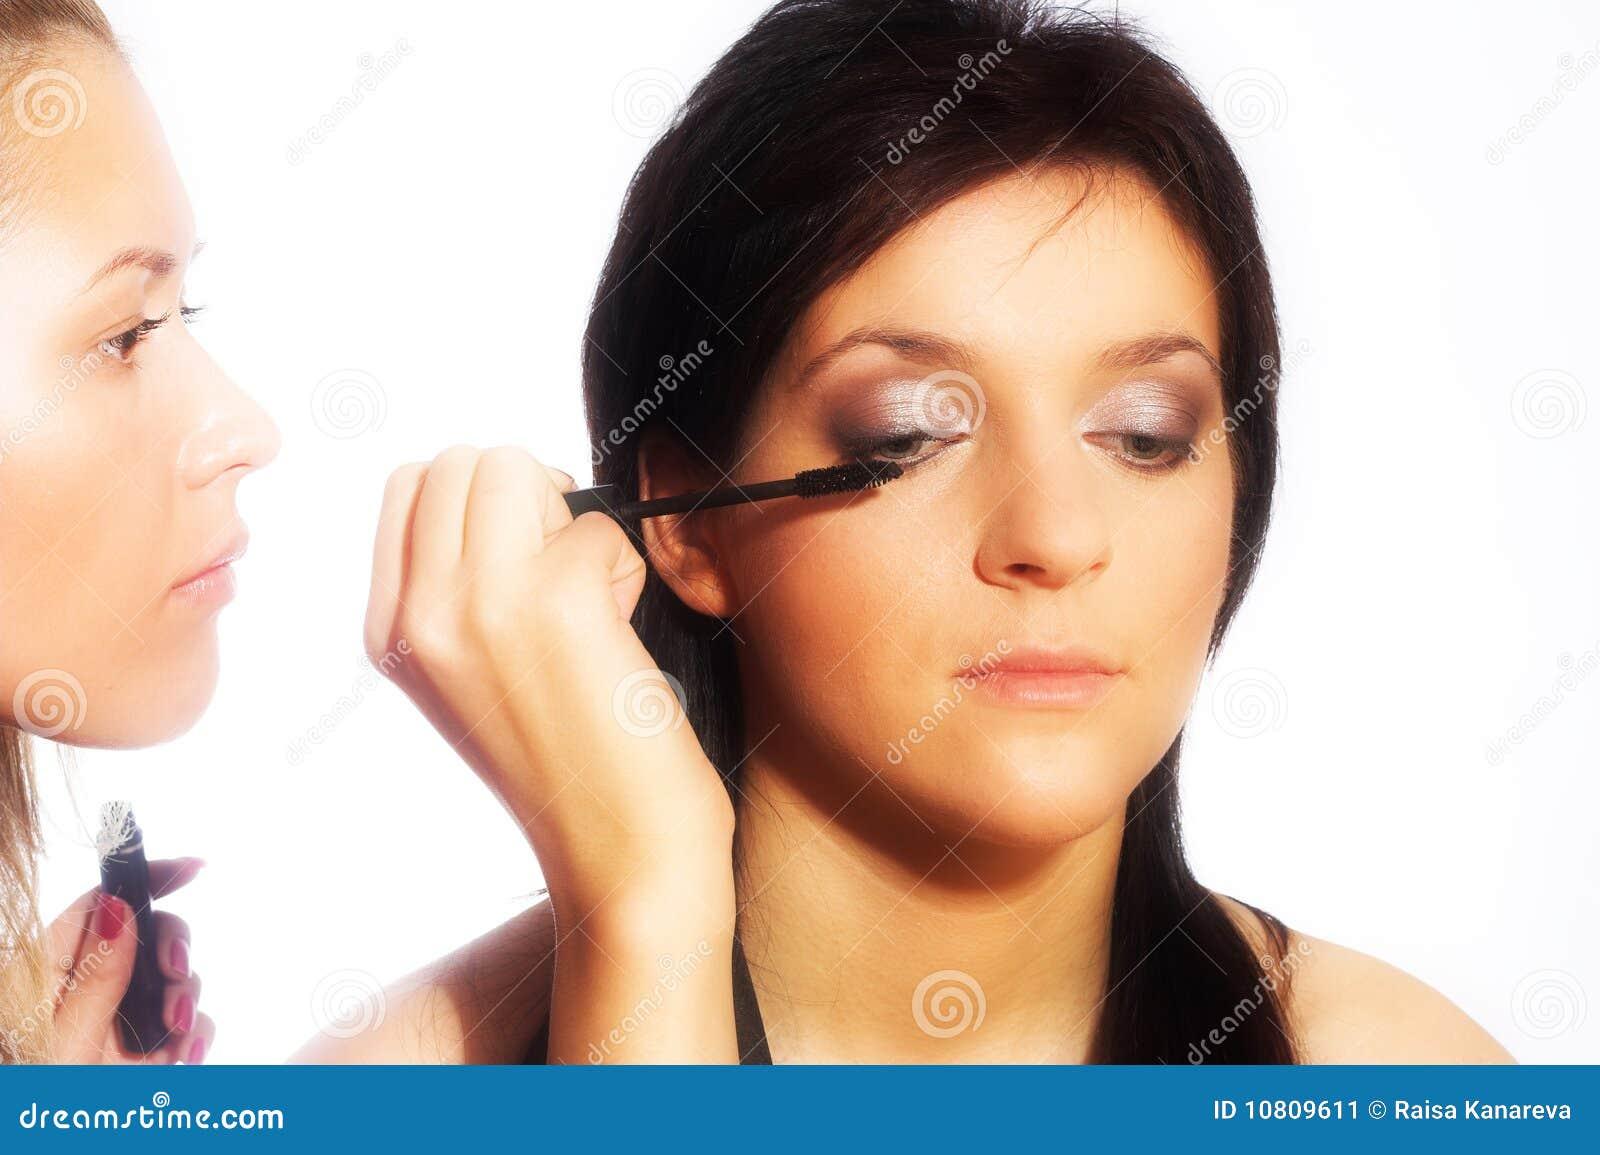 Makeup Artist ontime com